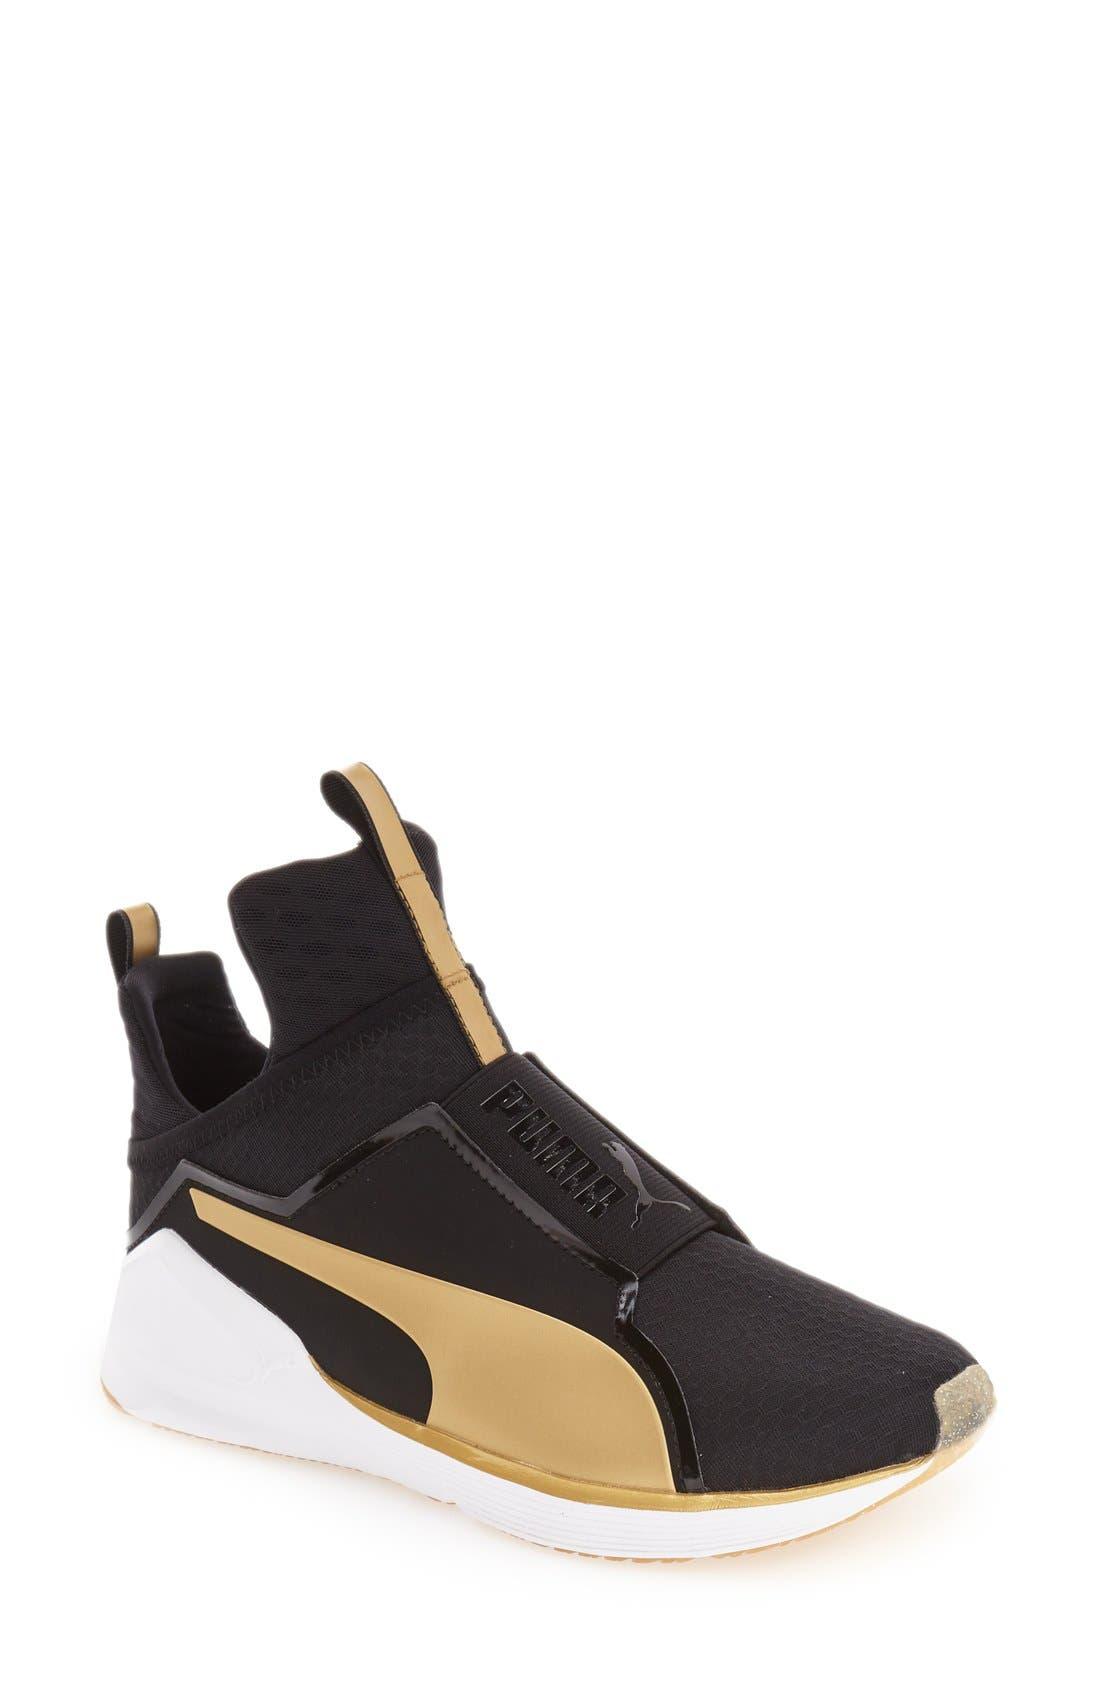 FENTY PUMA by Rihanna 'Fierce Gold' High Top Sneaker, Main, color, 001